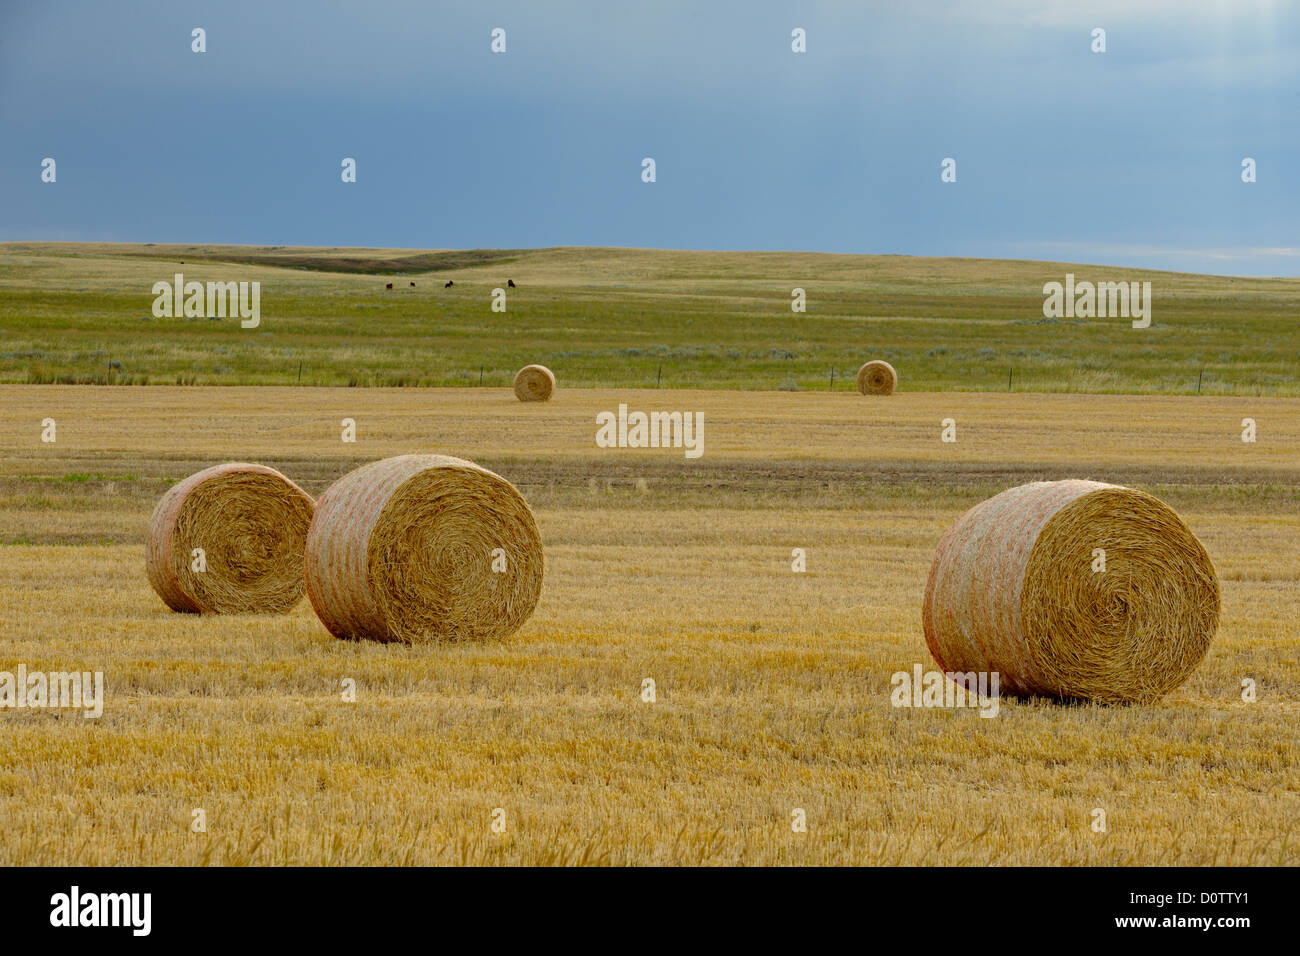 Hay rolls on the prairie, with threatening skies, Glasgow, Montana, USA Stock Photo